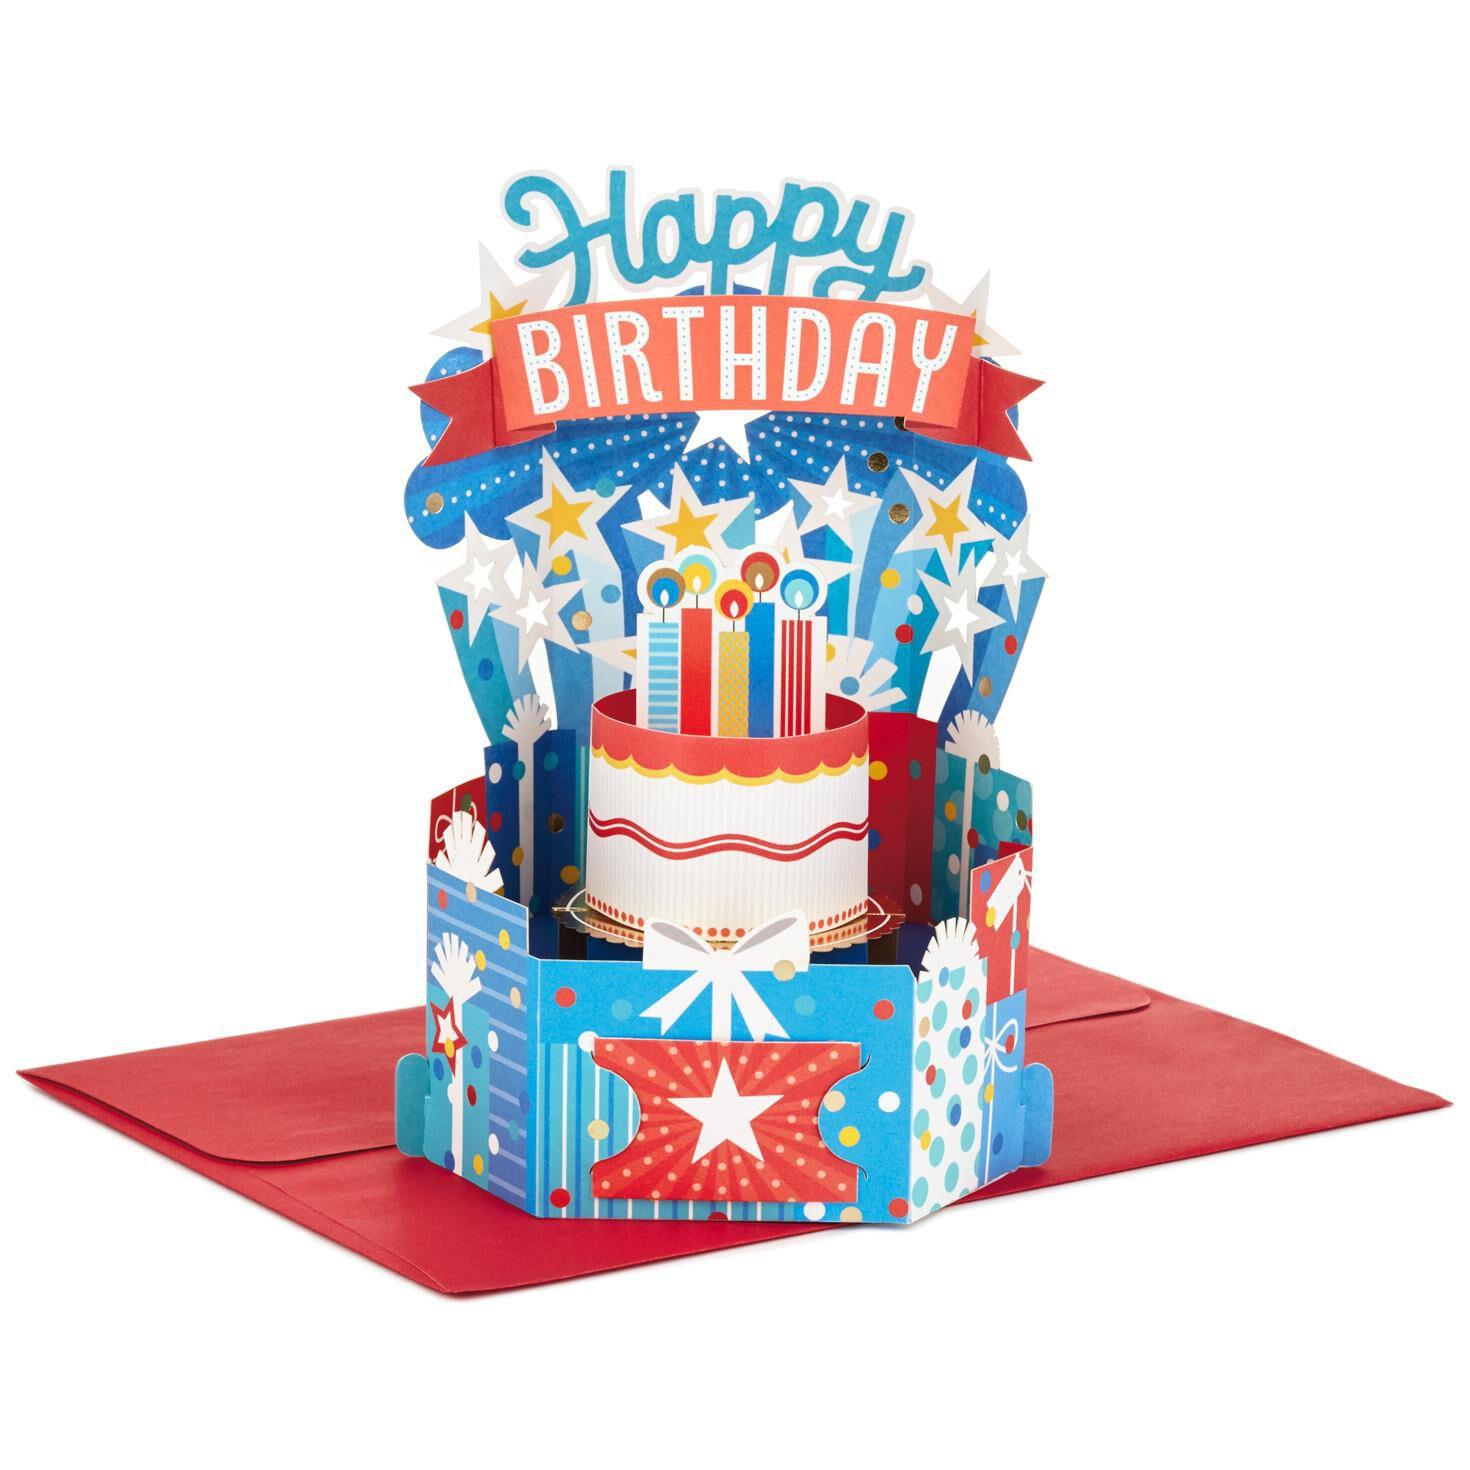 Colorful Birthday Celebration Pop Up Birthday Card Greeting – Pop Up Birthday Cake Card